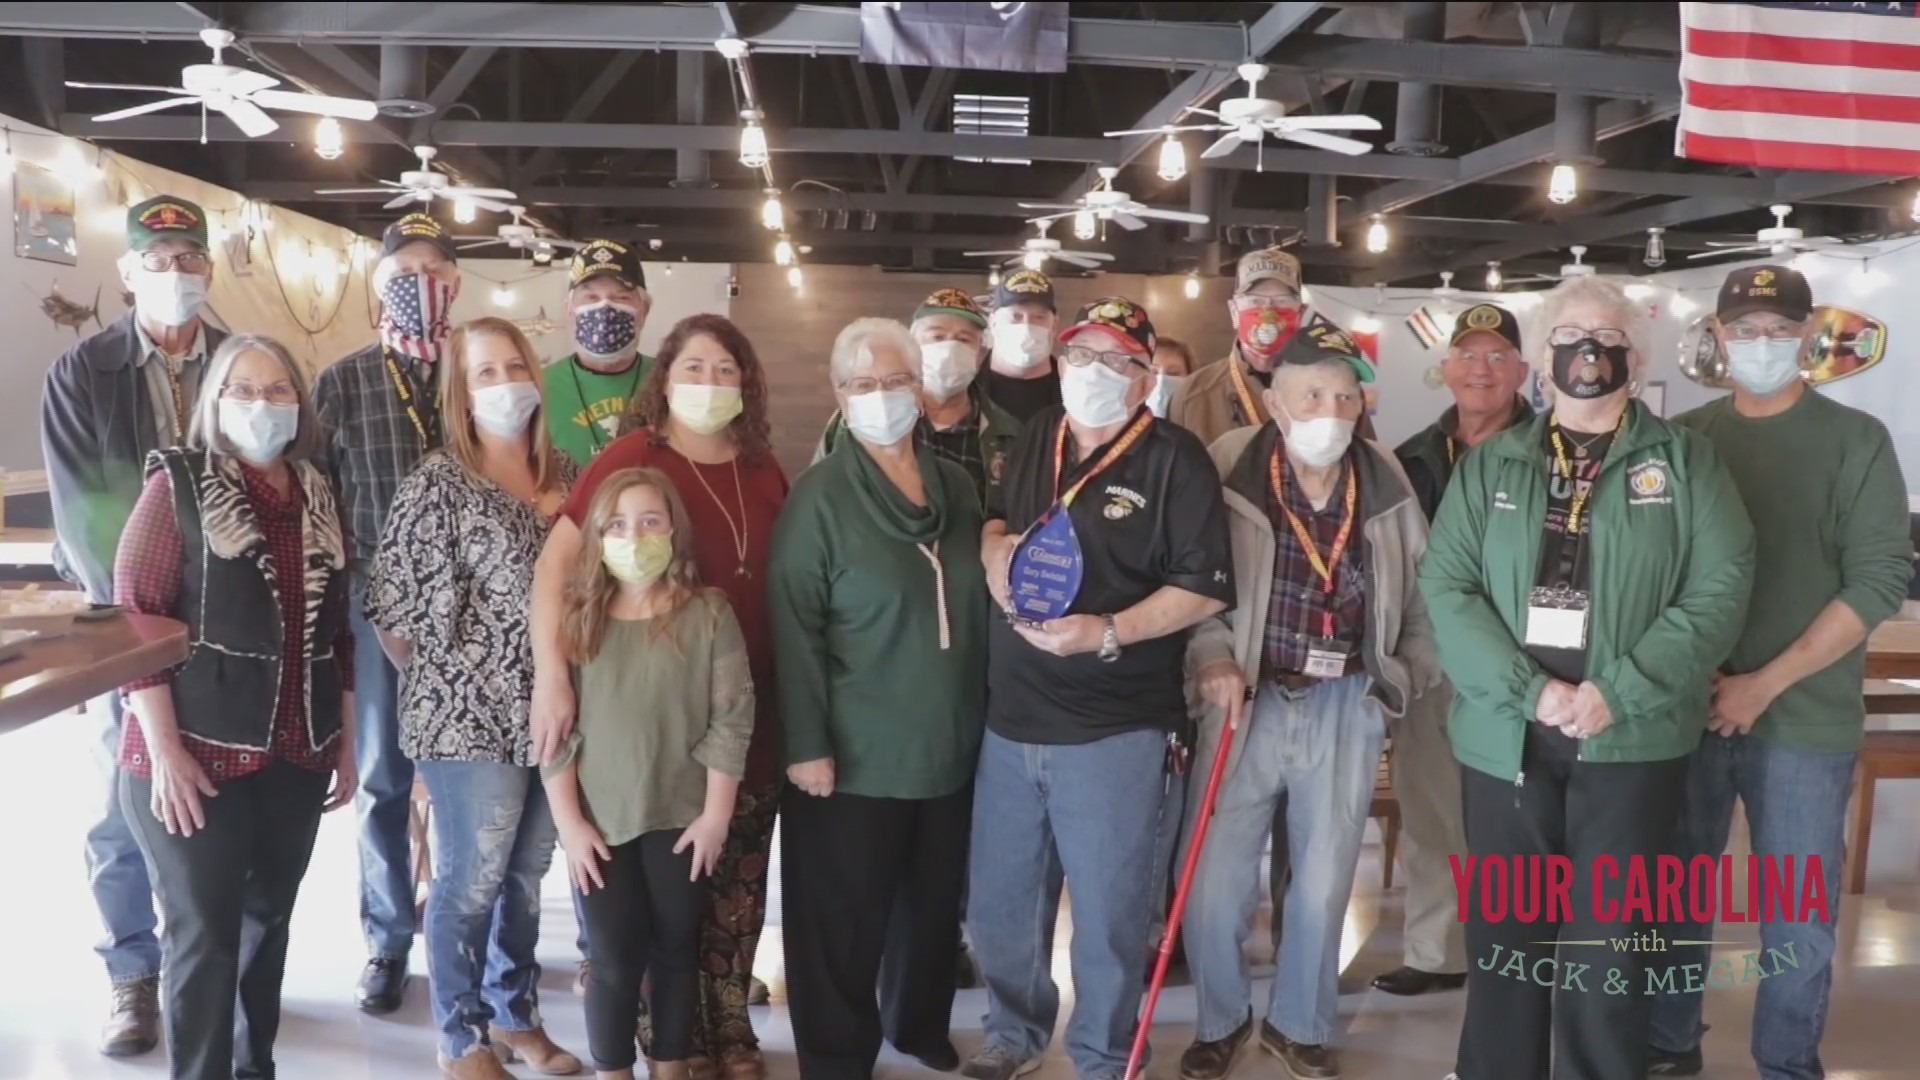 7News Honors Gary Swistak With The Caring for the Carolinas Community Service Hero Award